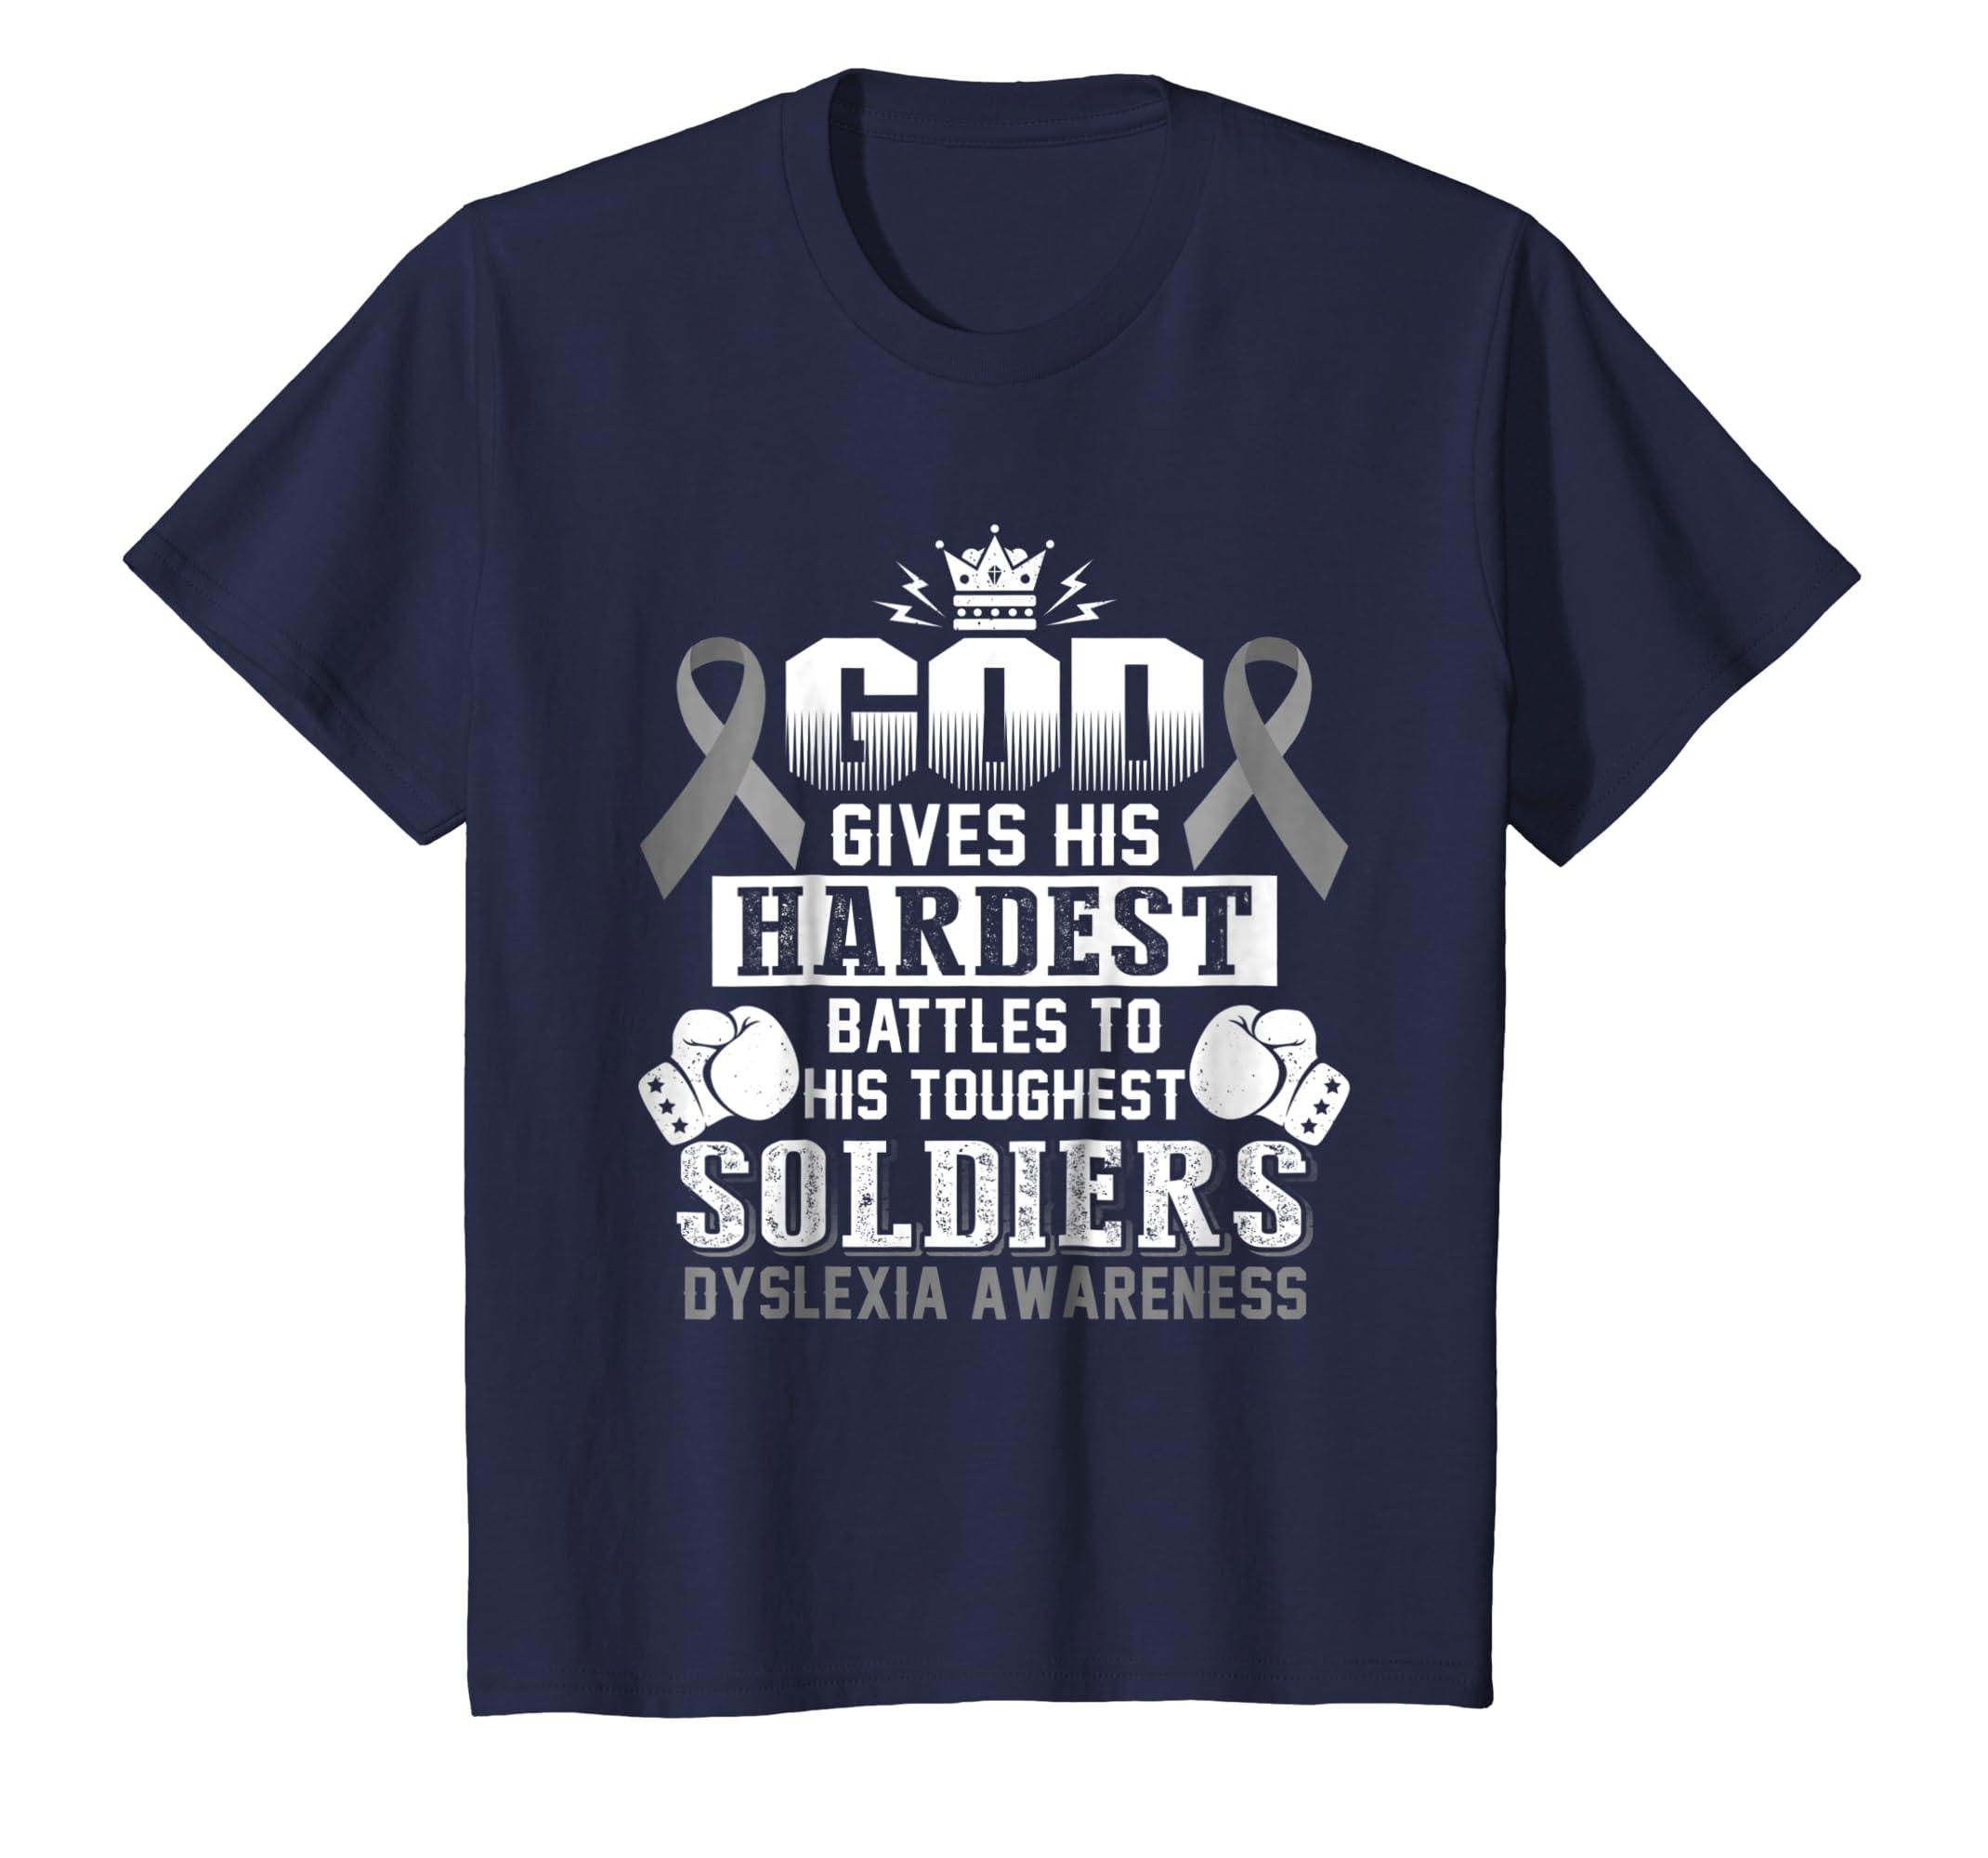 God's touchest soldiers DYSLEXIA AWARENESS t shirt